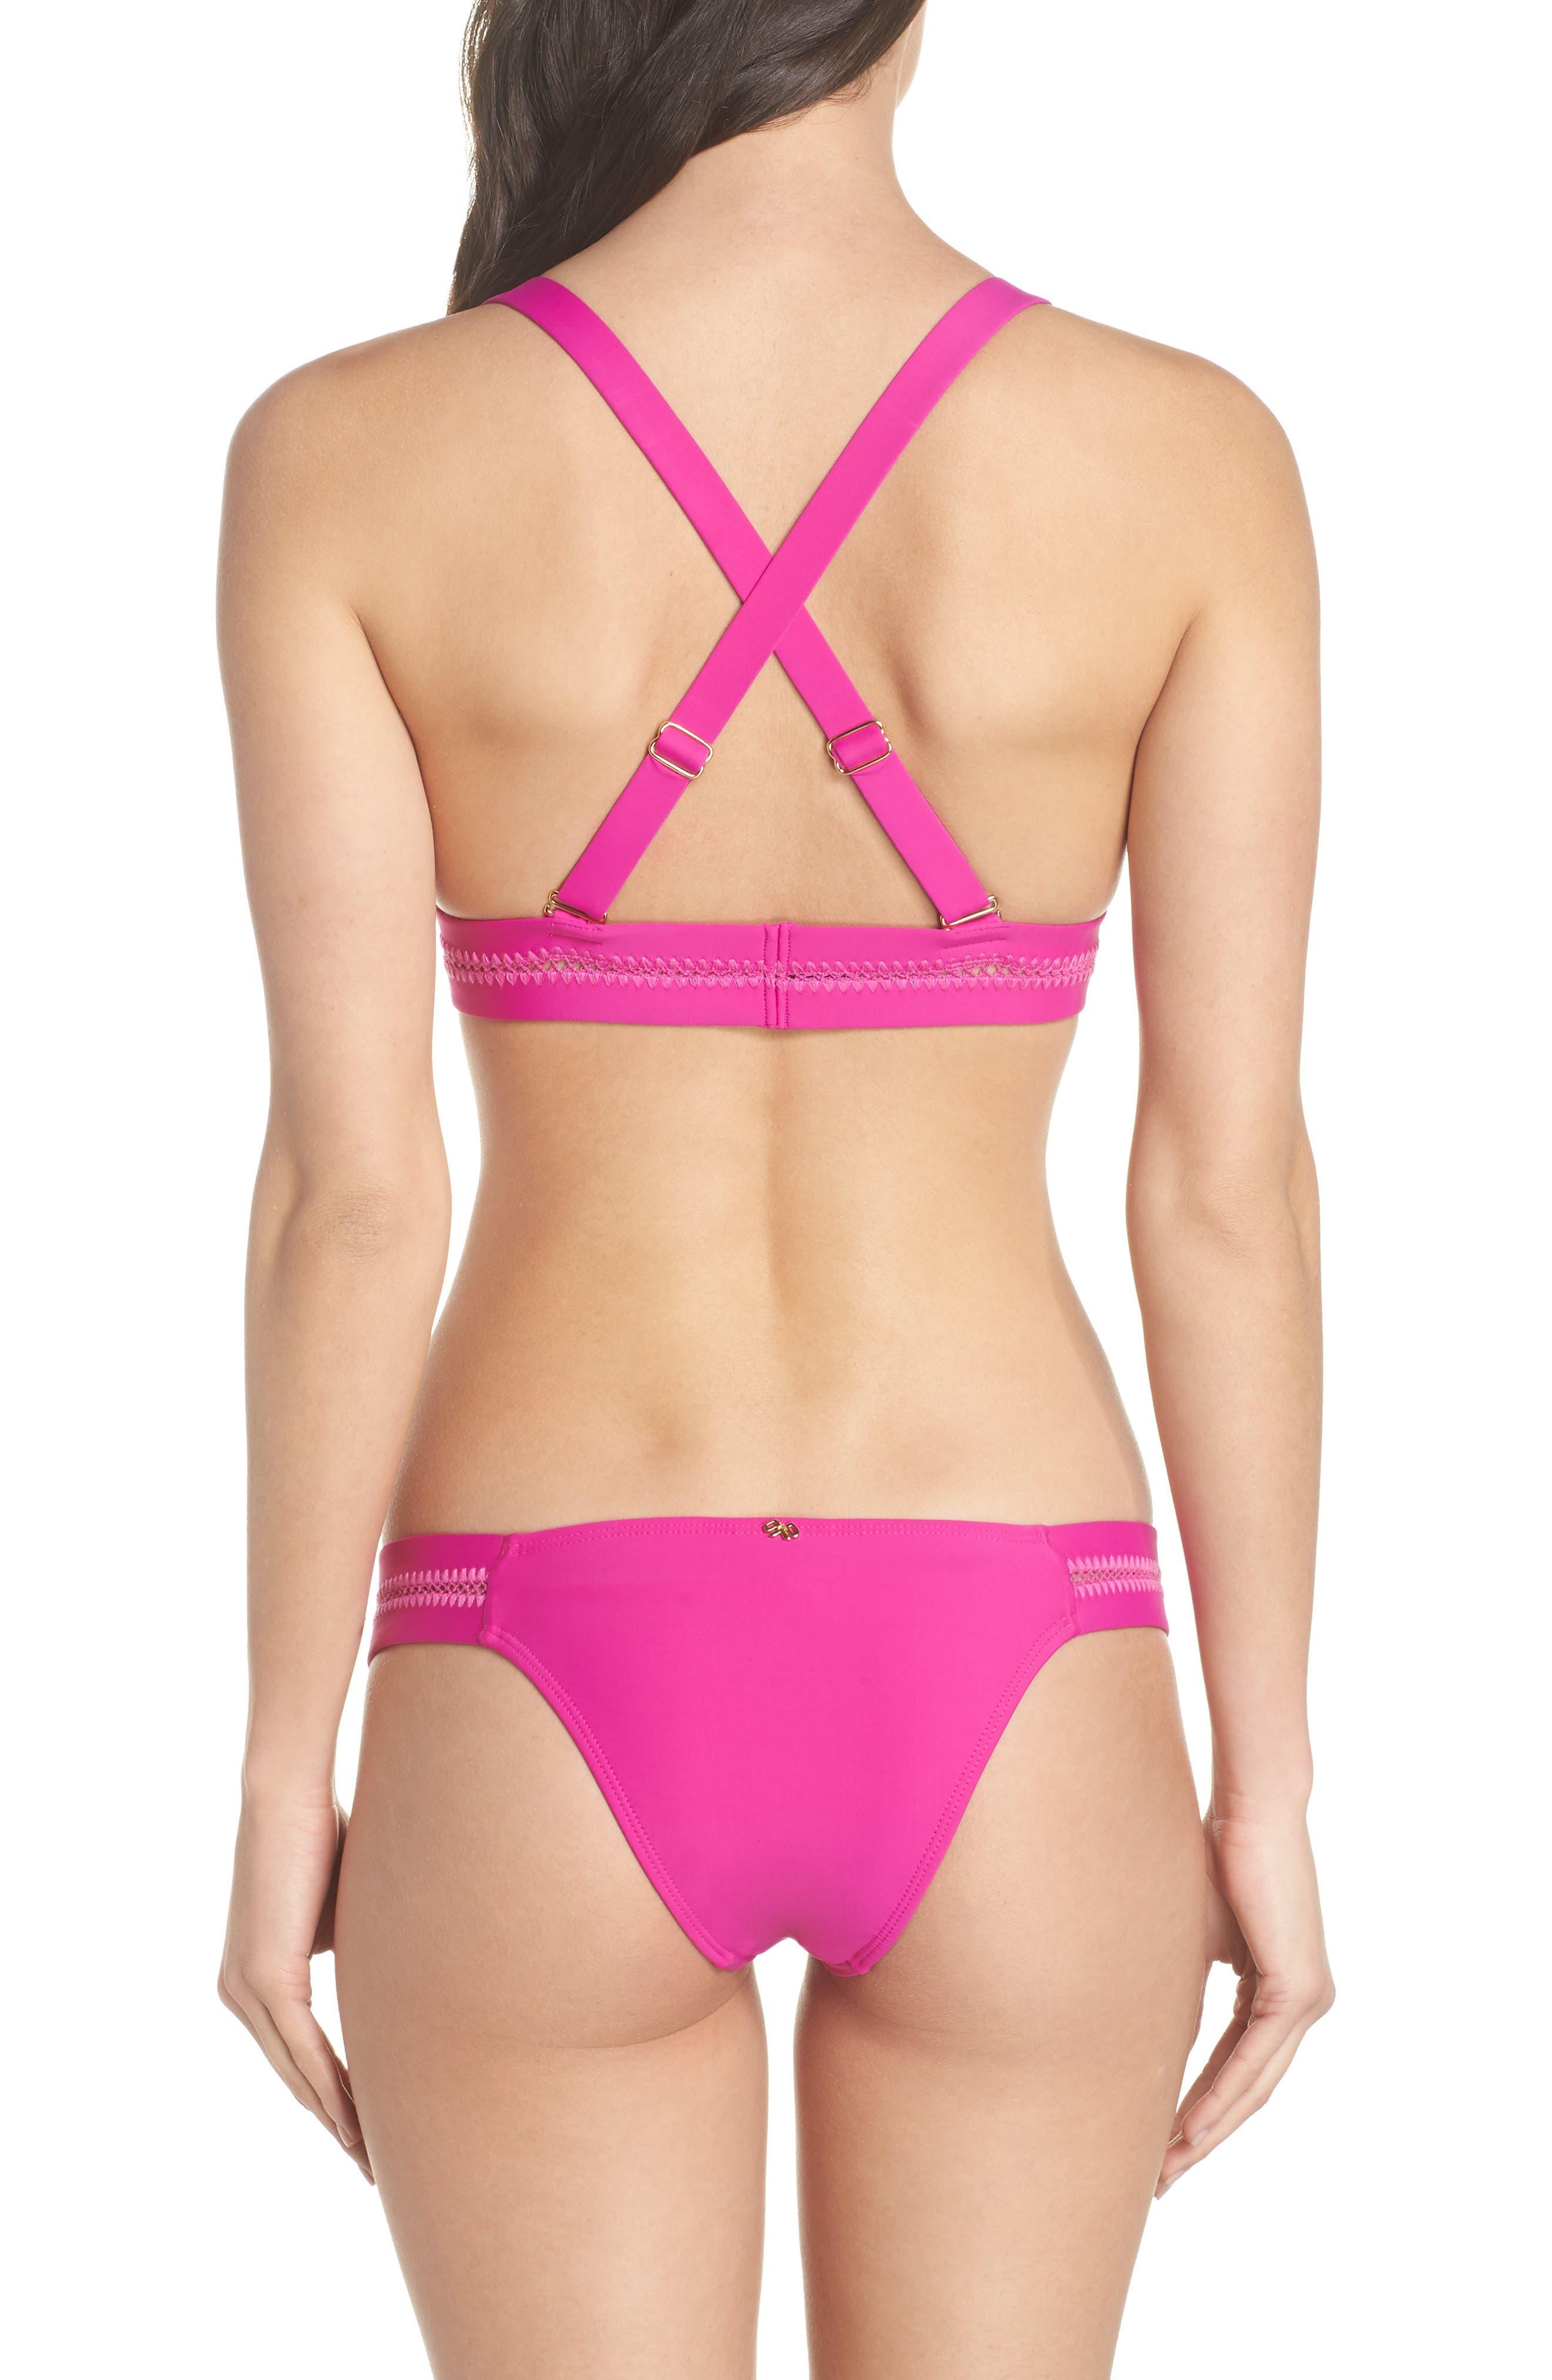 Stitched Elle Halter Bikini Top,                             Alternate thumbnail 9, color,                             Fuchsia